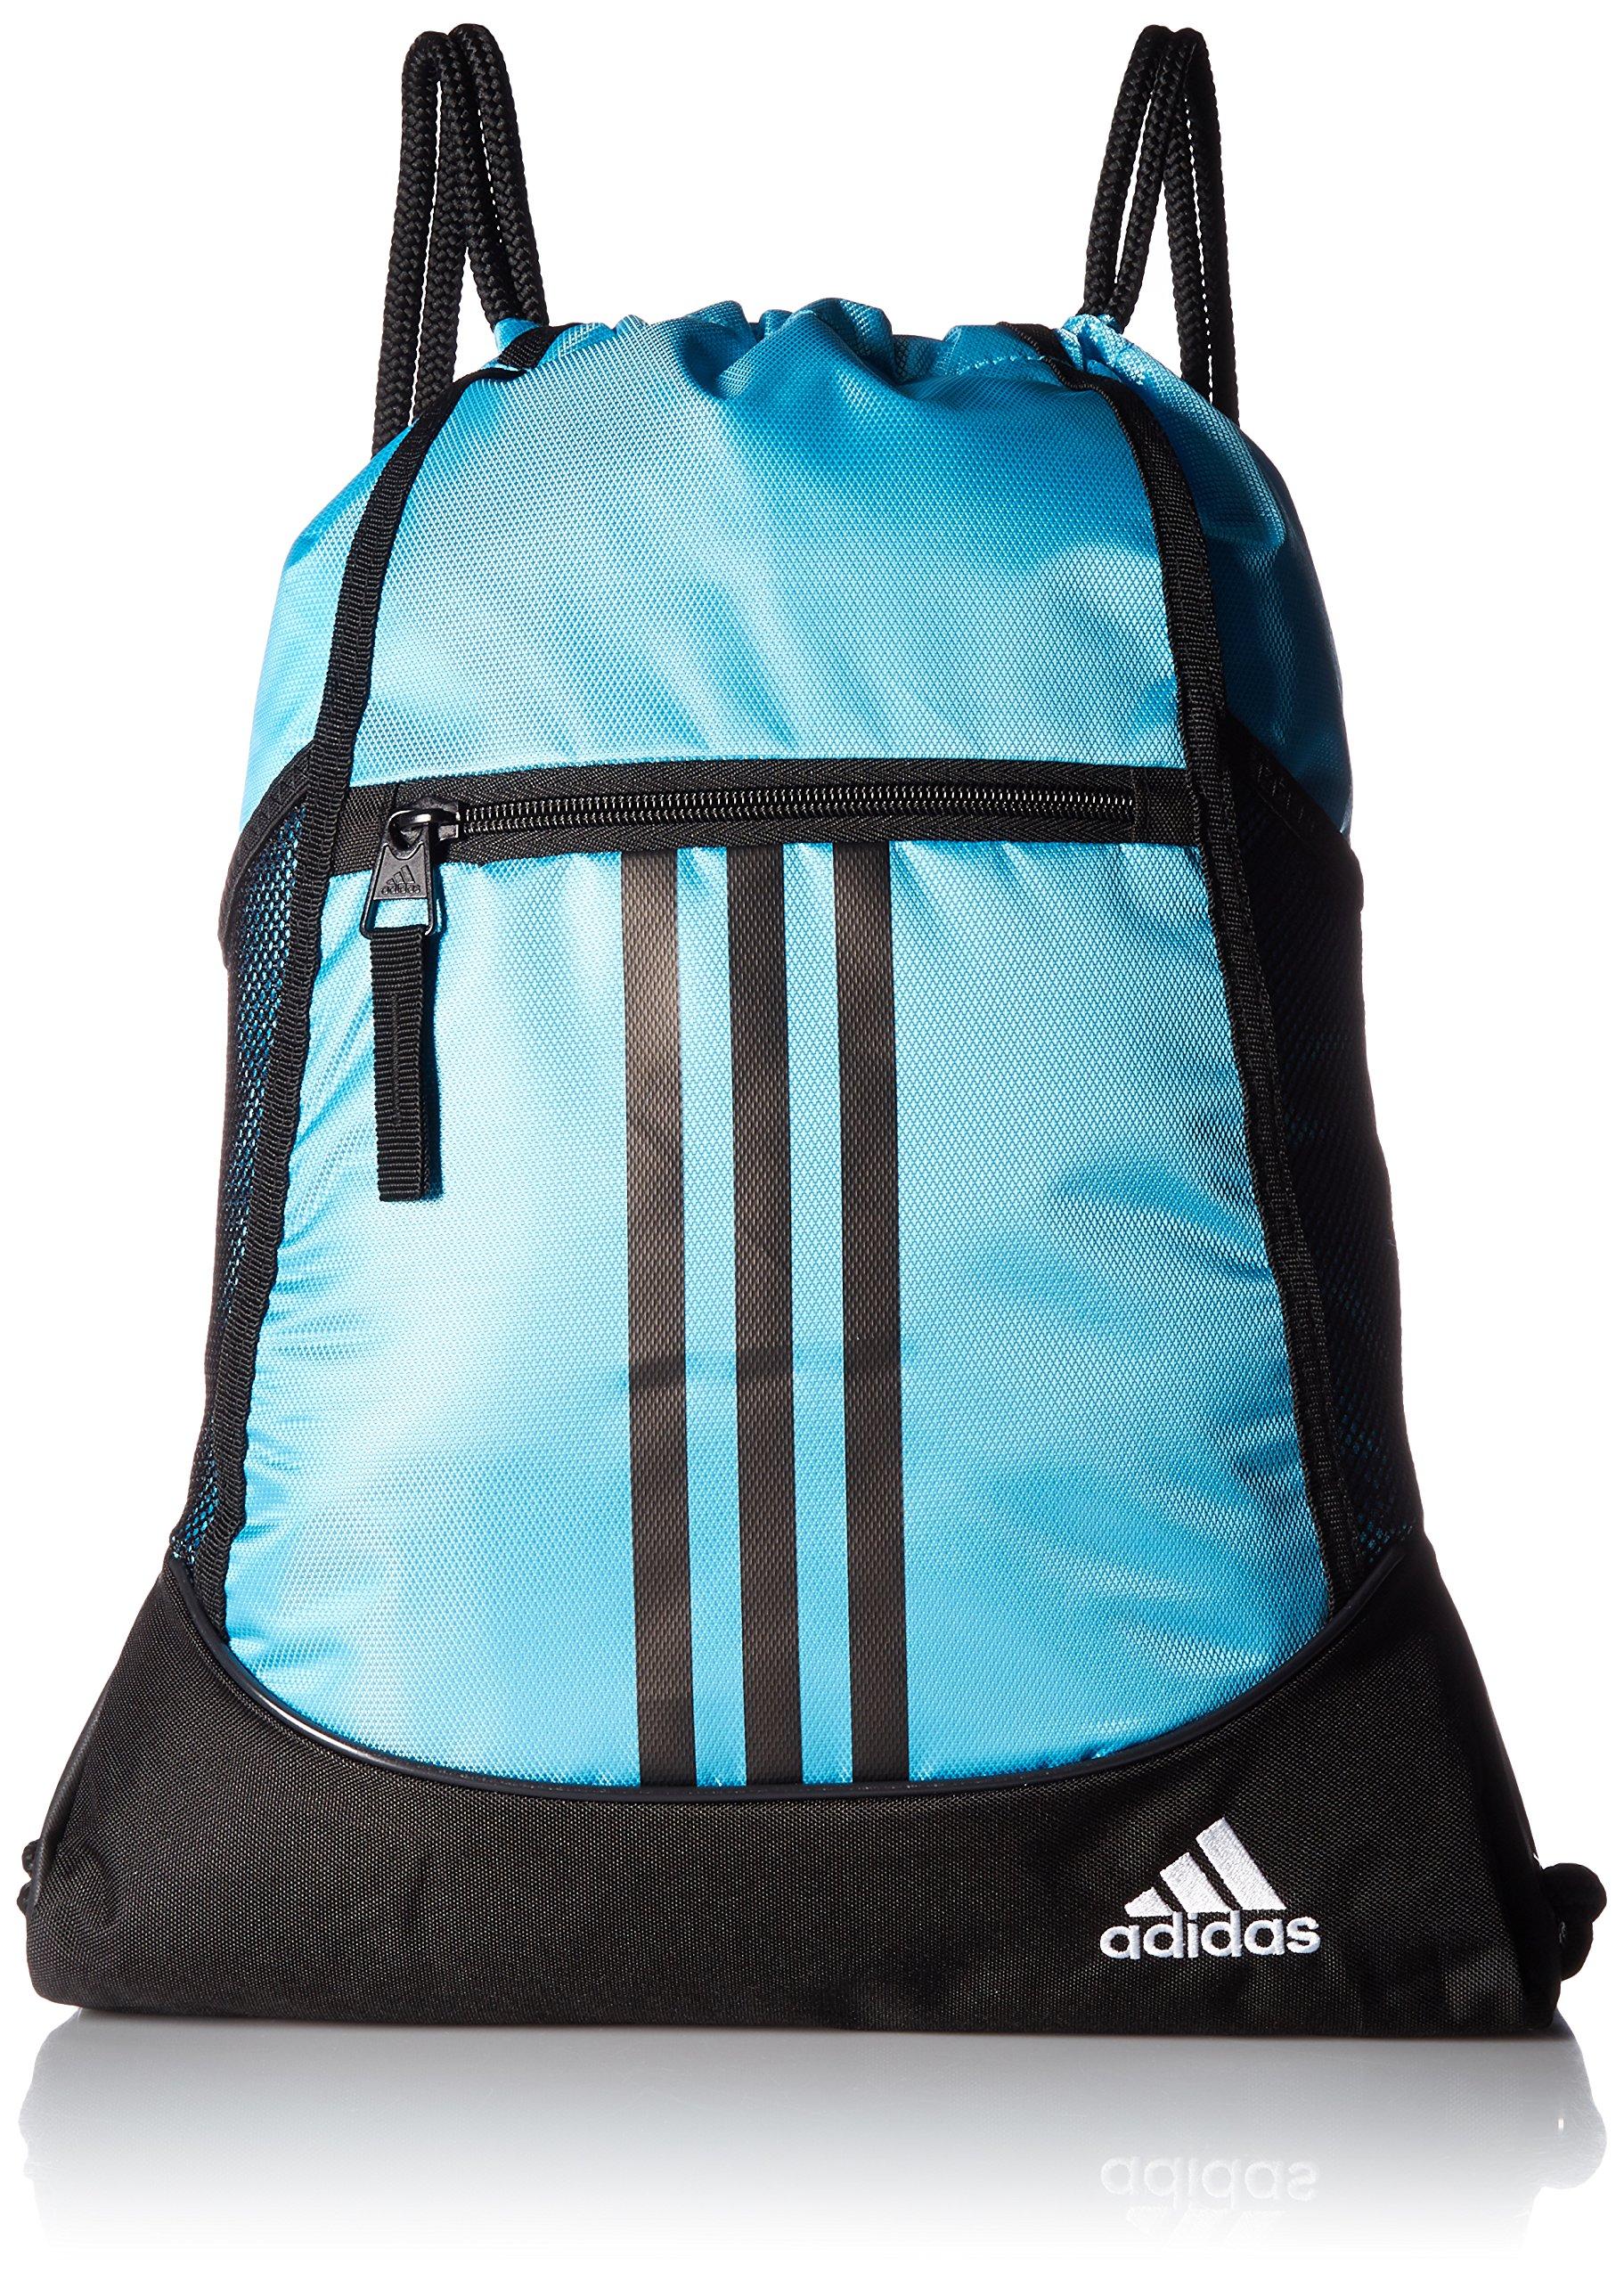 adidas Alliance II sackpack, Bright Cyan/Black/White, One Size by adidas (Image #1)